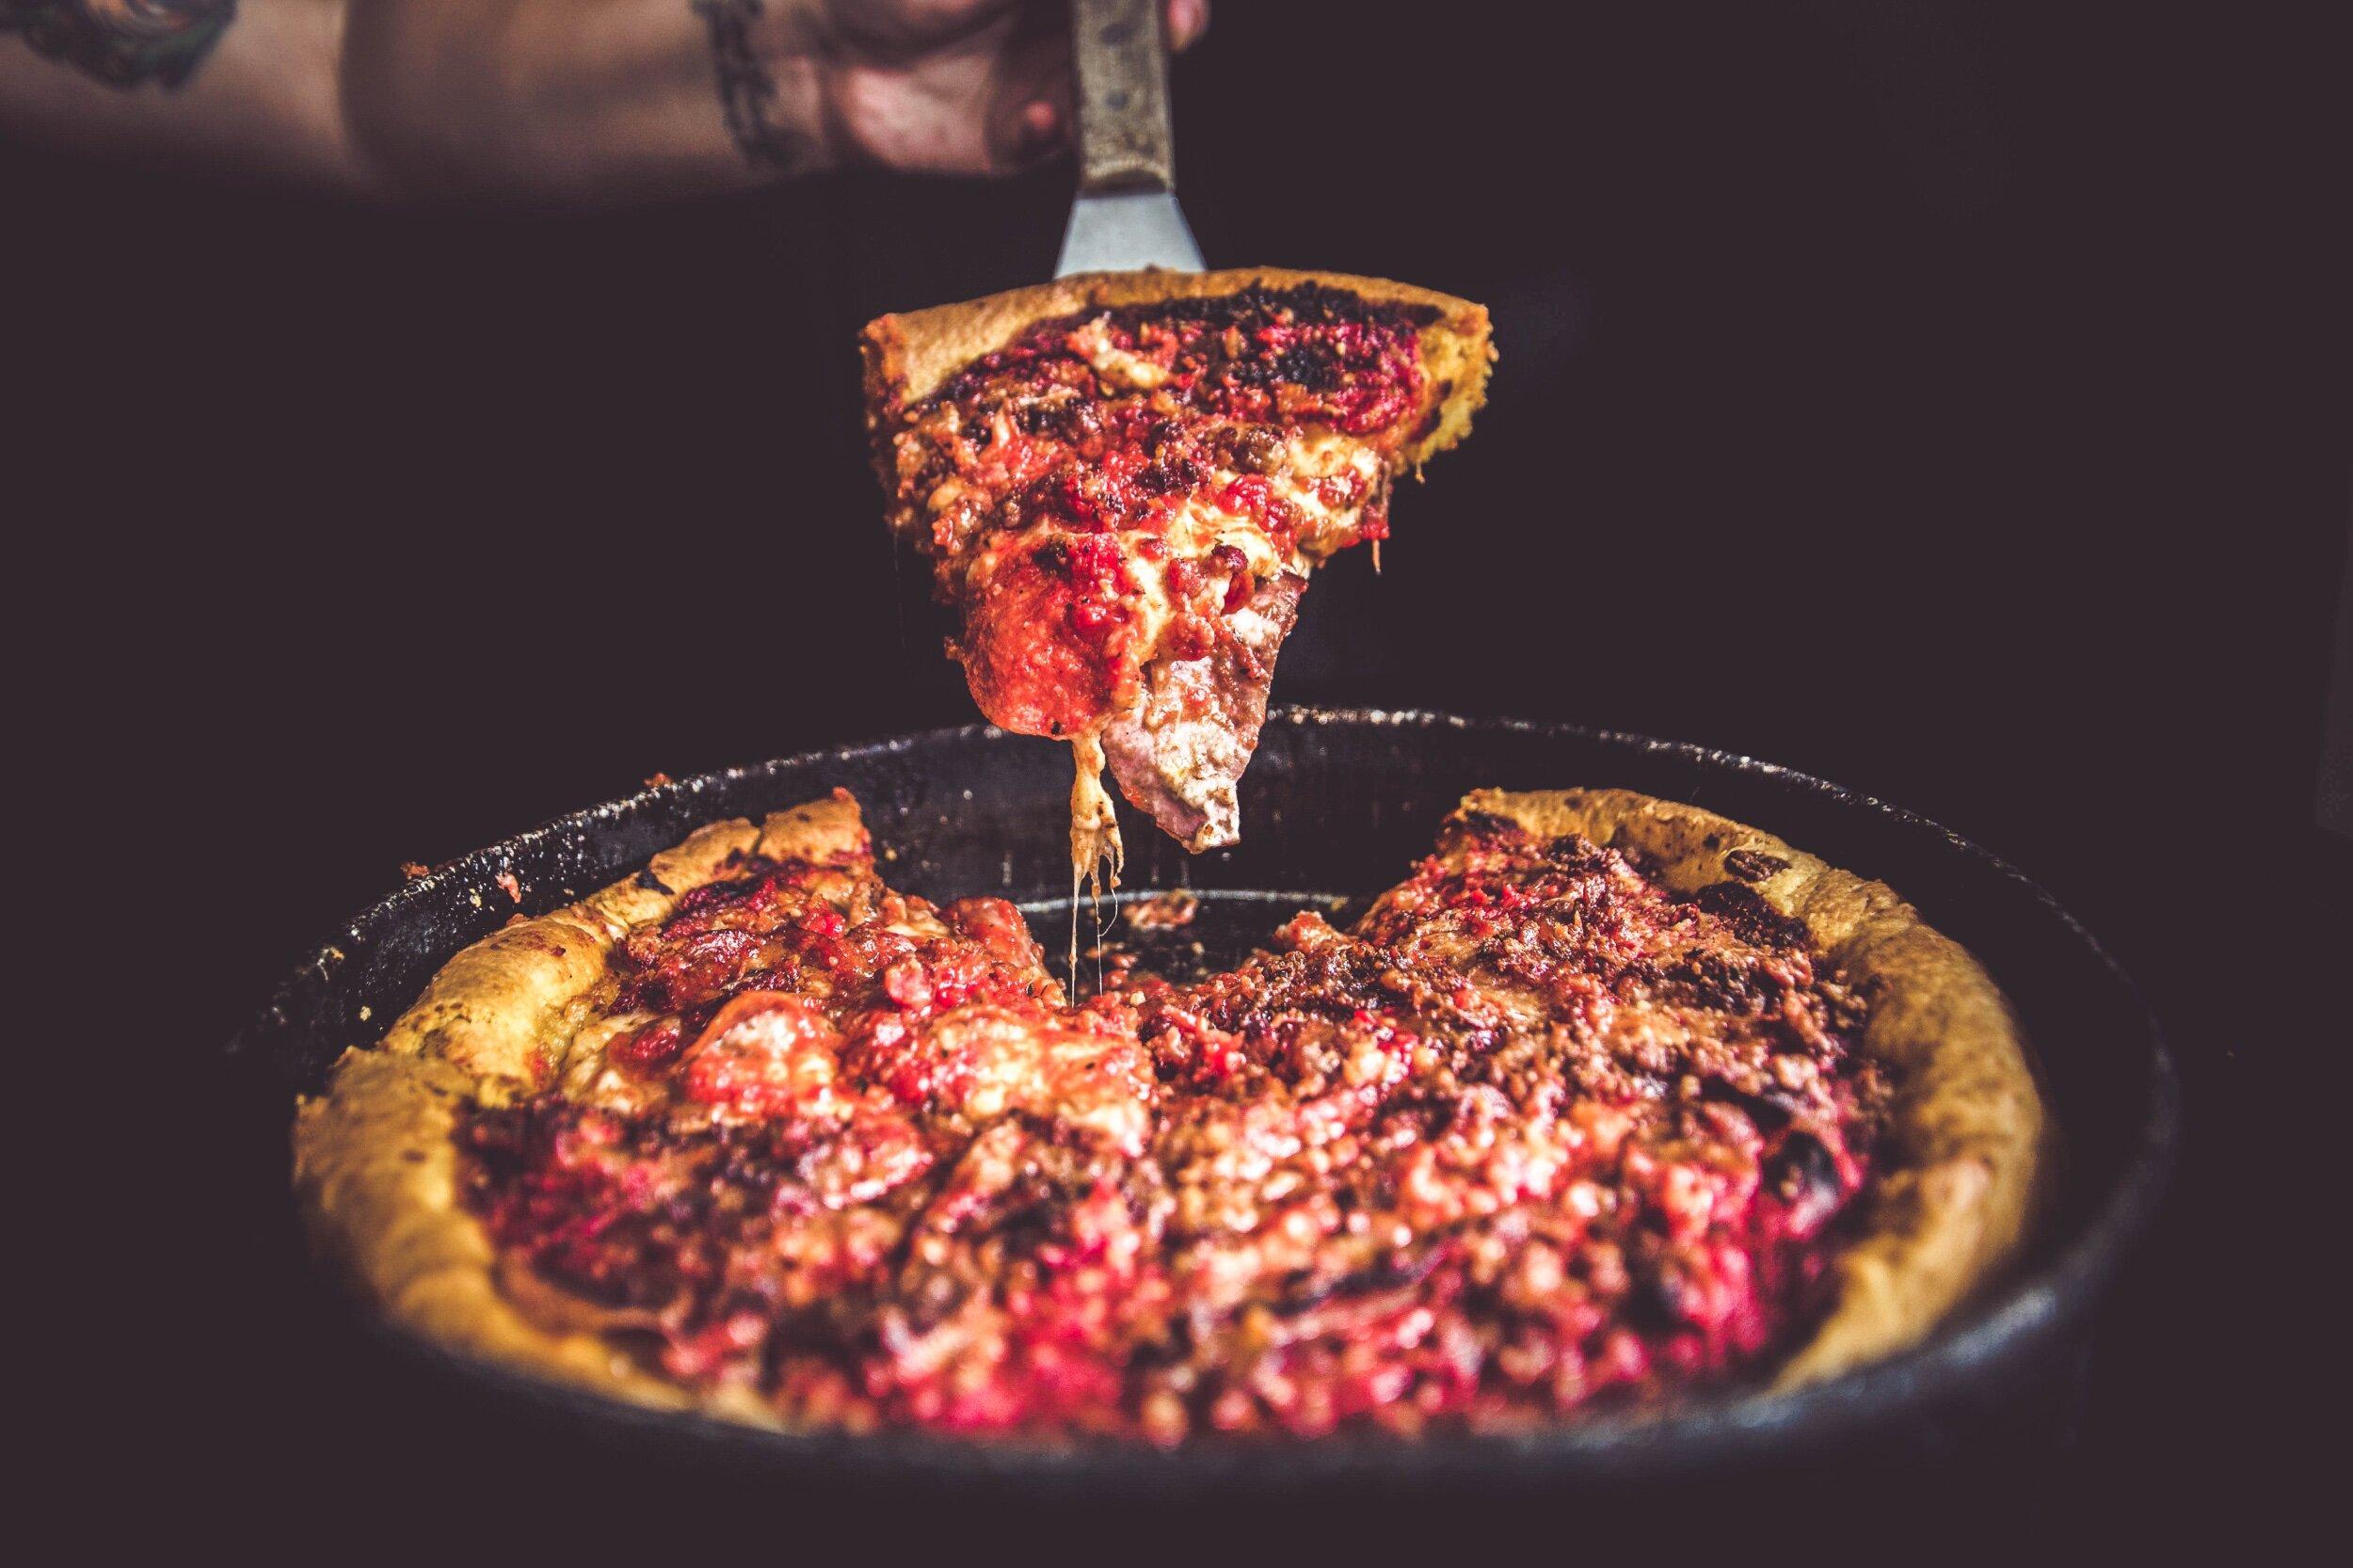 wheaton pizza, restaurants downtown wheaton il, catering wheaton il, pizza near me, best pizza near me